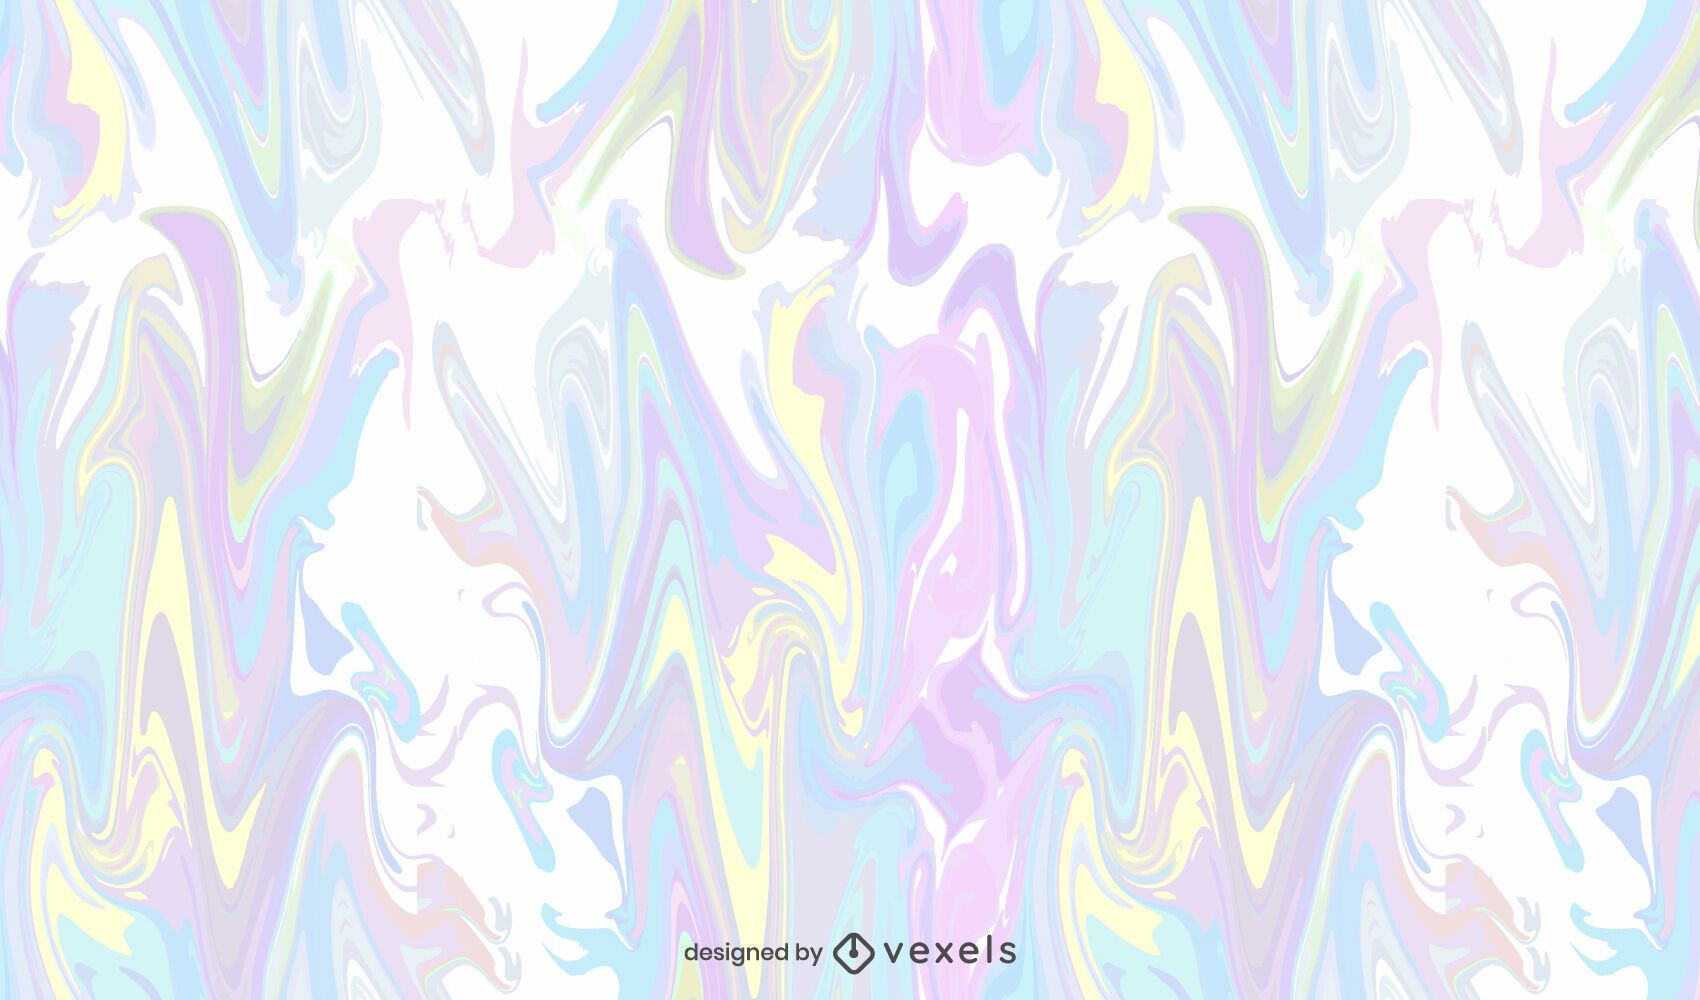 Desenho de padrão tie-dye pastel